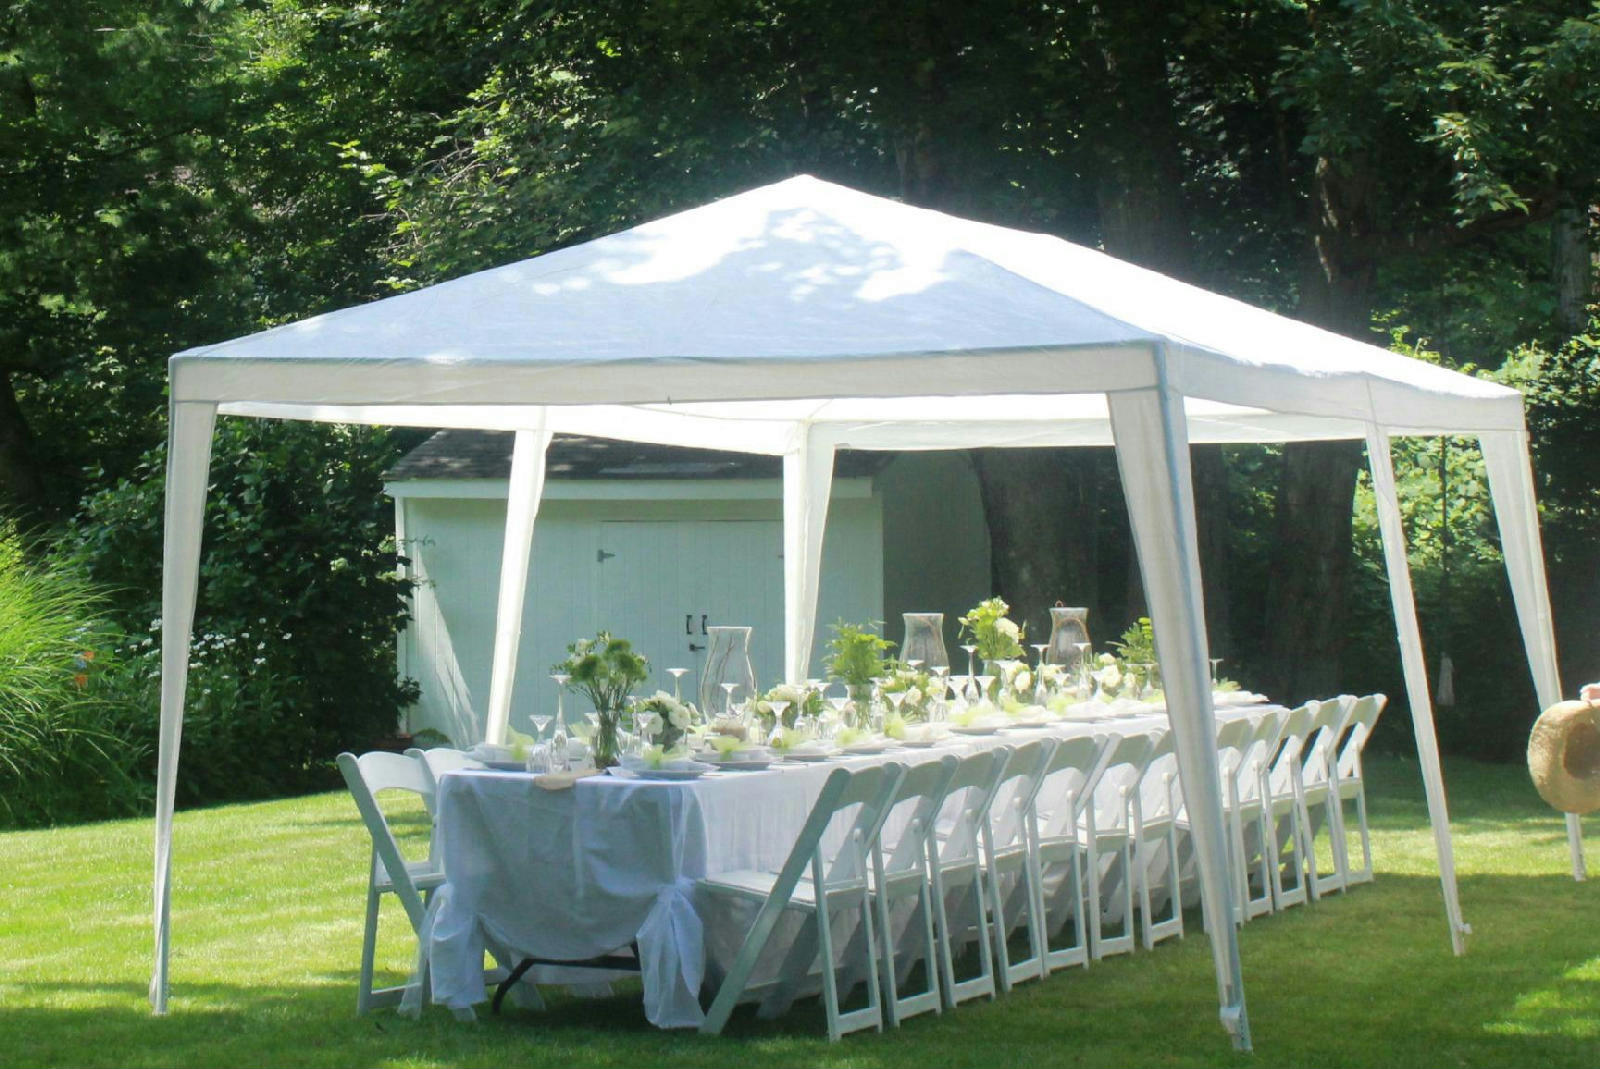 Quictentr 10 x 20 outdoor heavy duty wedding gazebo party for Garden tents